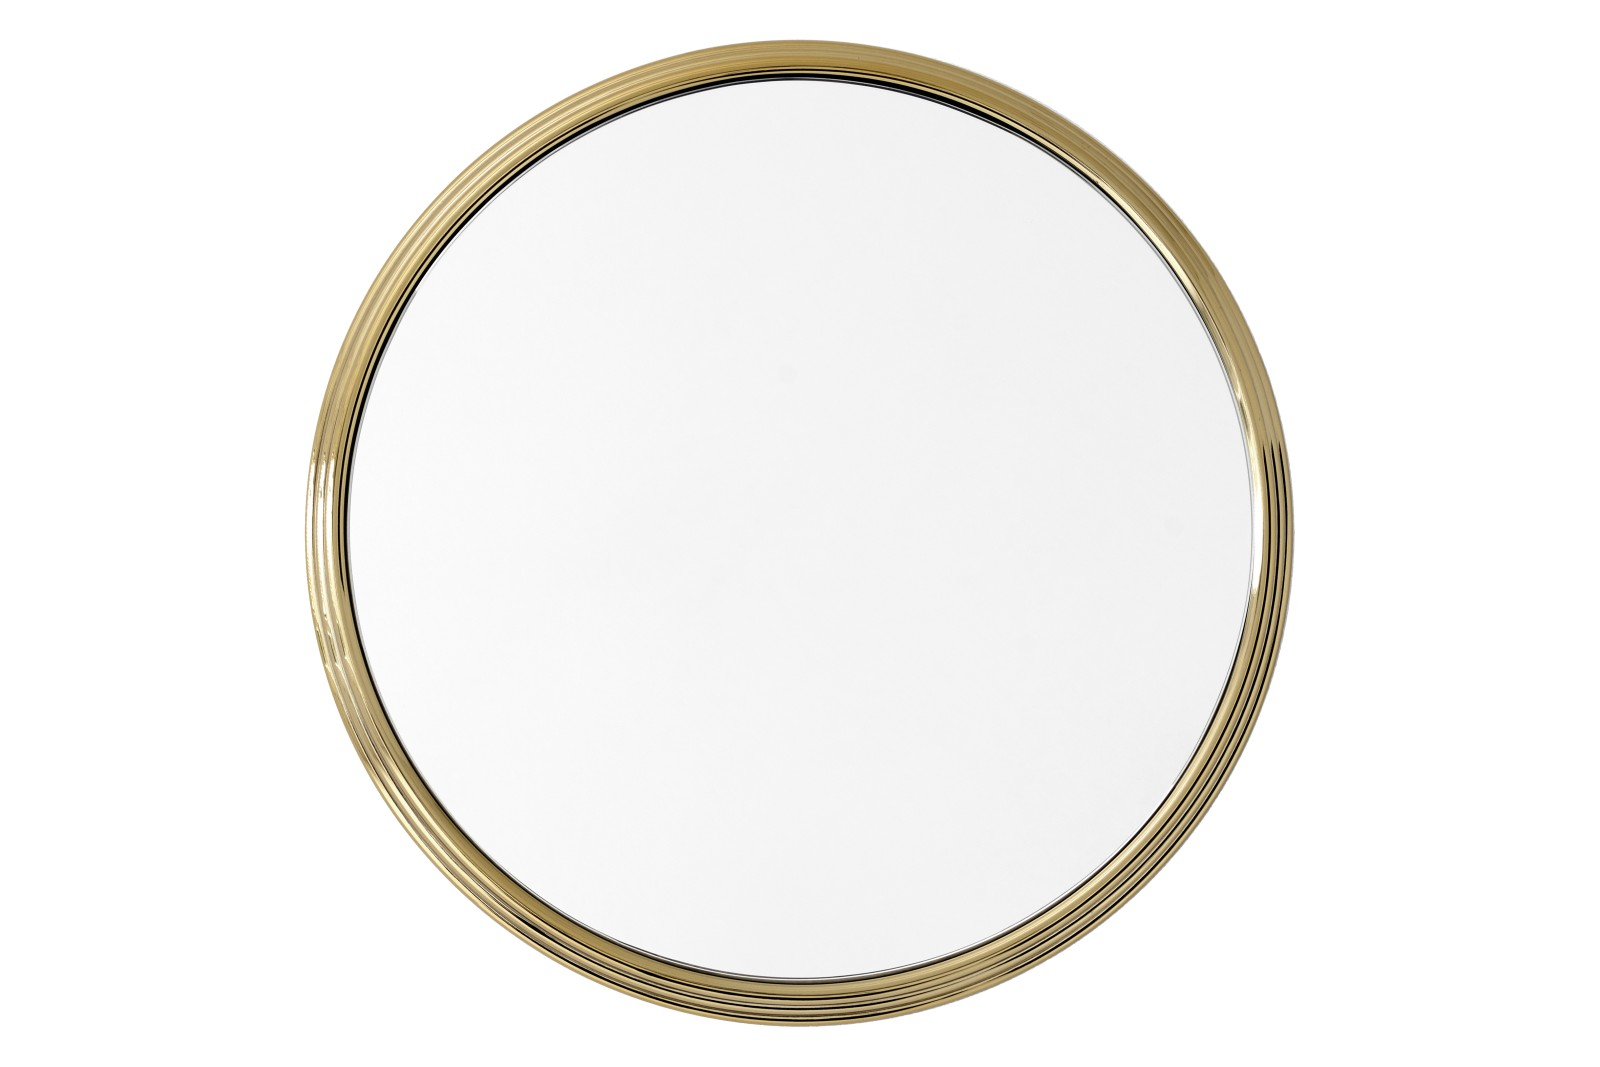 Sillon SH4 Round Mirror SH4 Brass